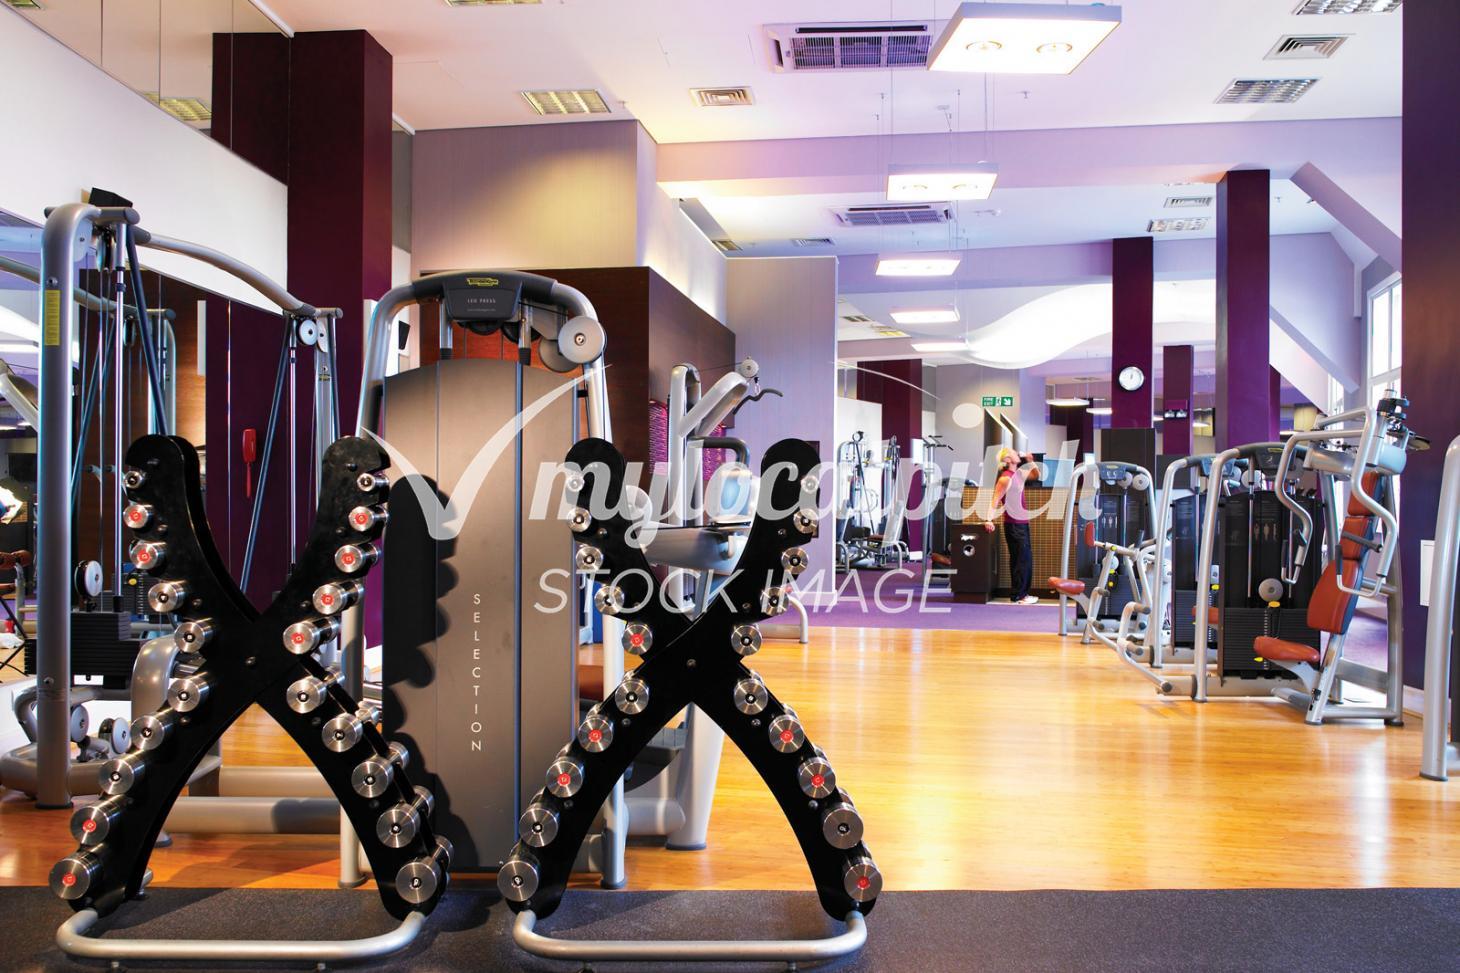 The Bridge Leisure Centre Gym gym